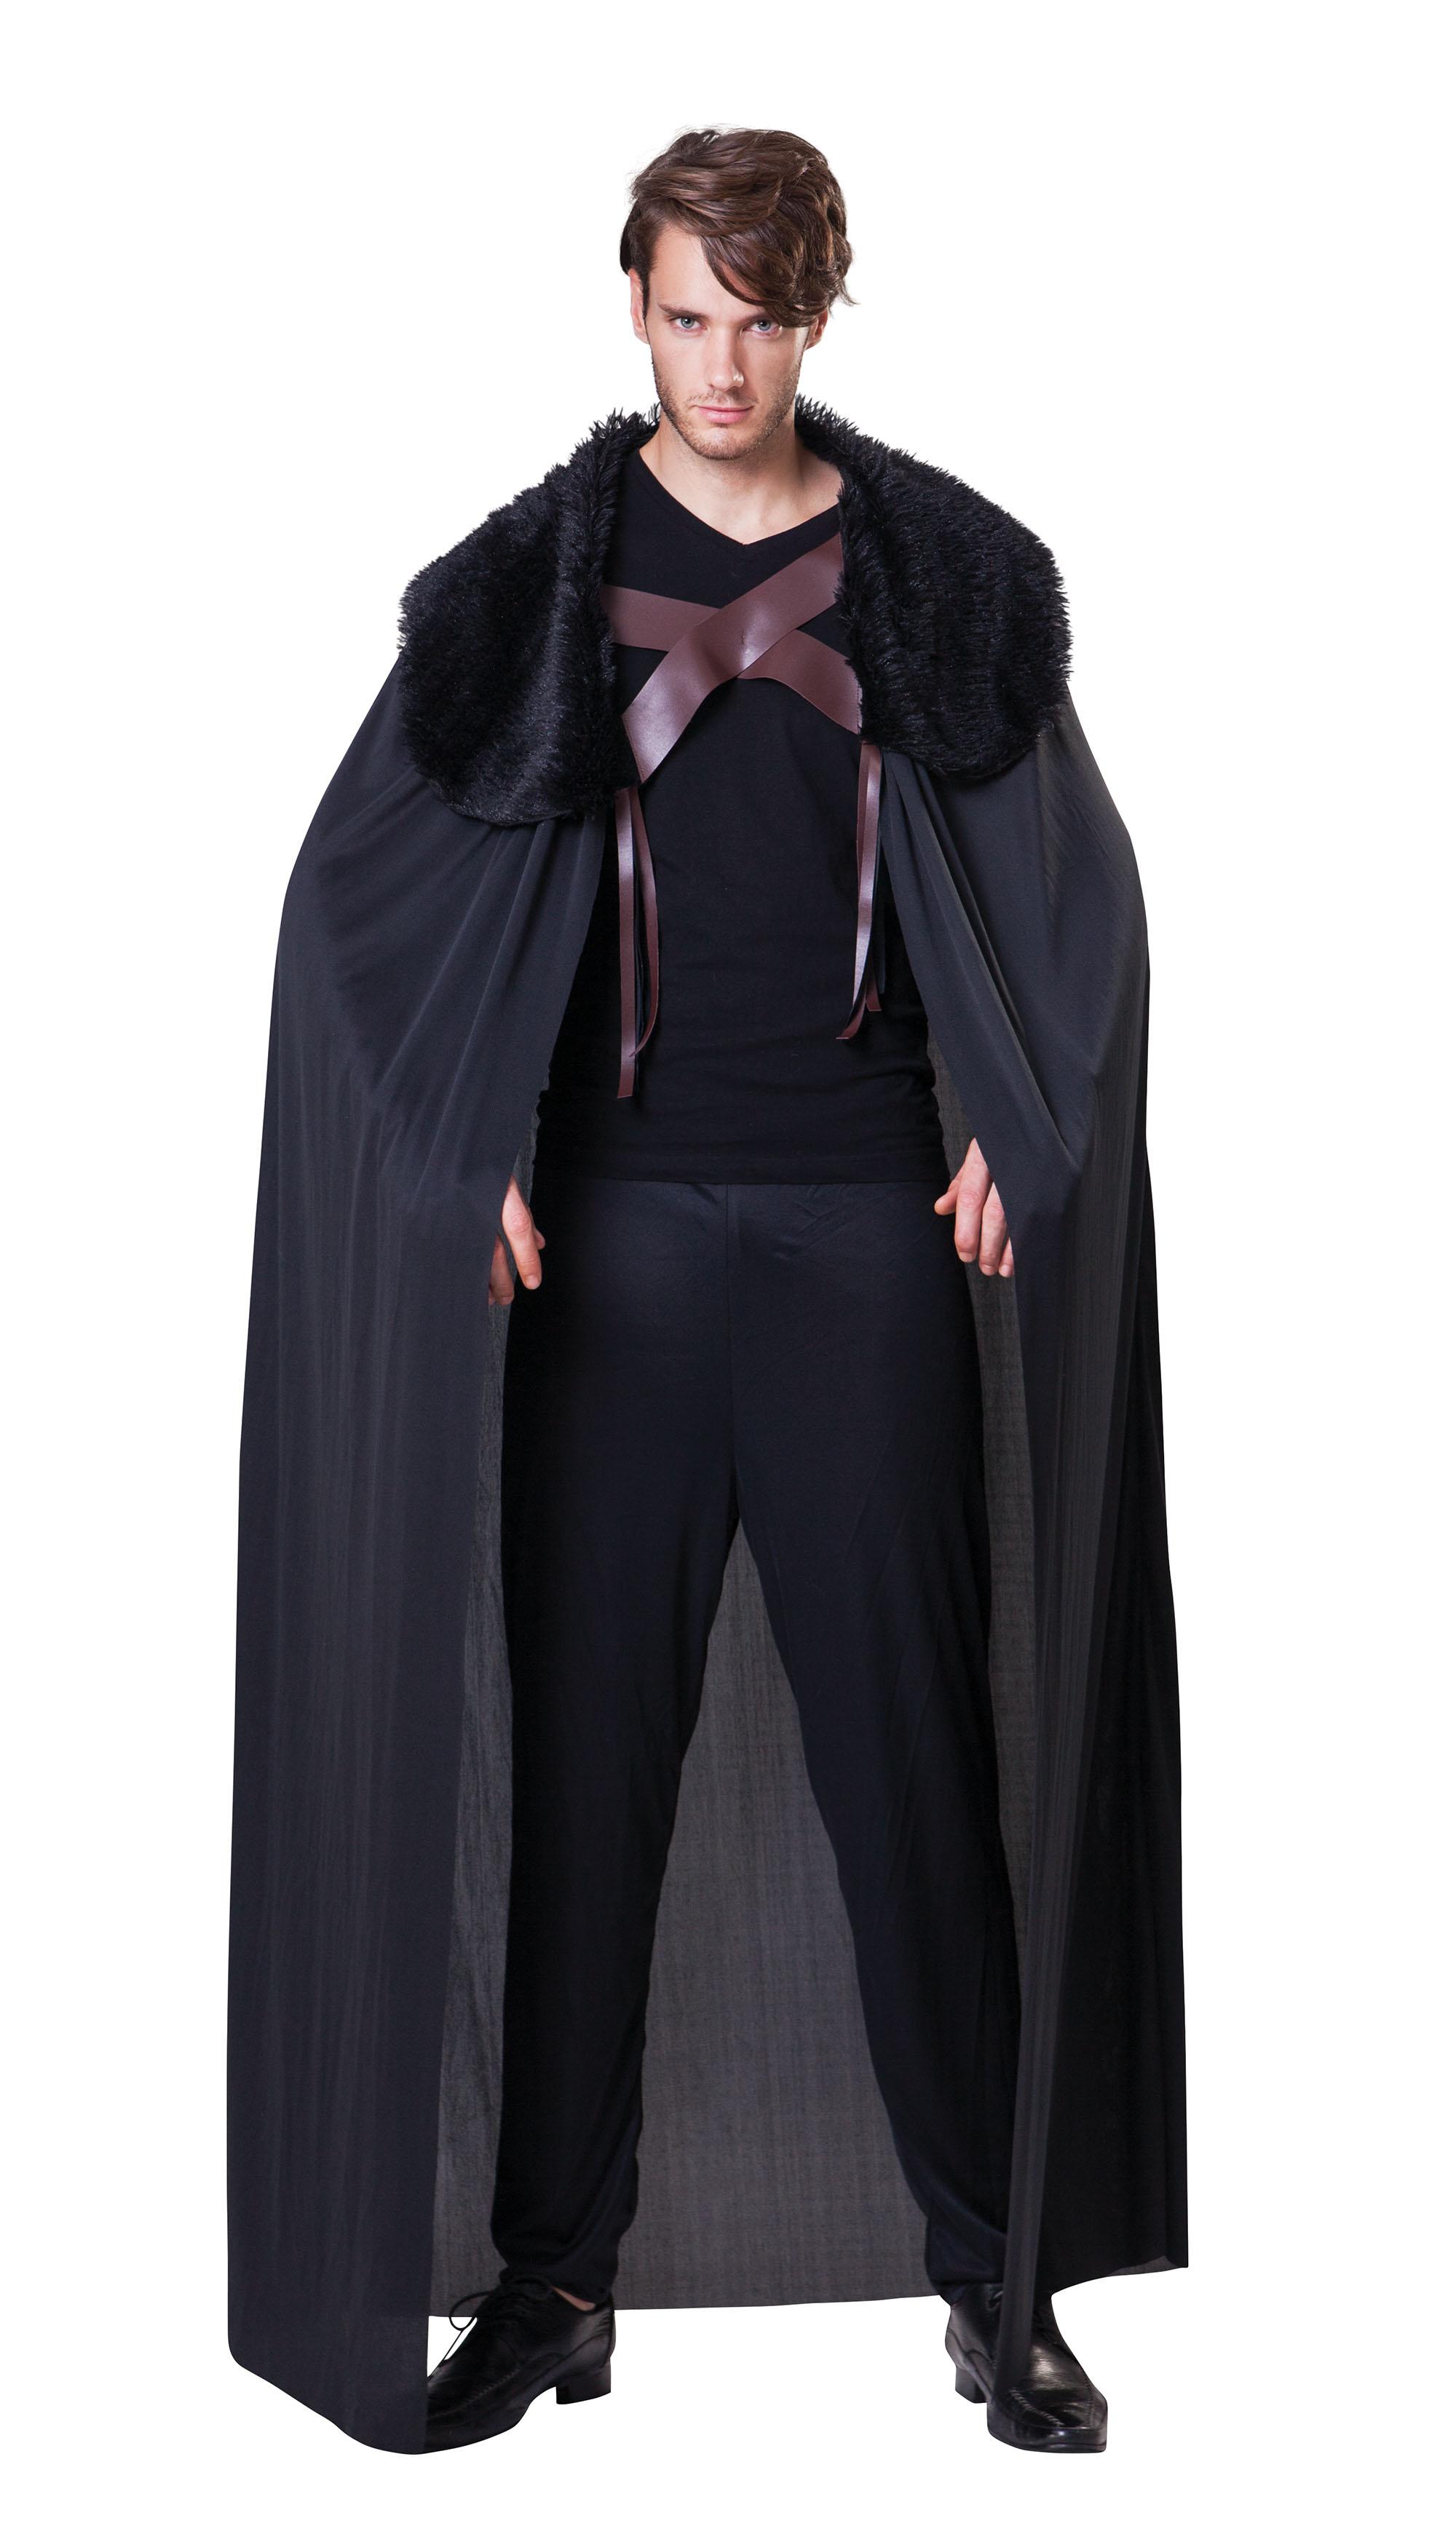 Black Cape With Fur Collar Mens Costume Accessory